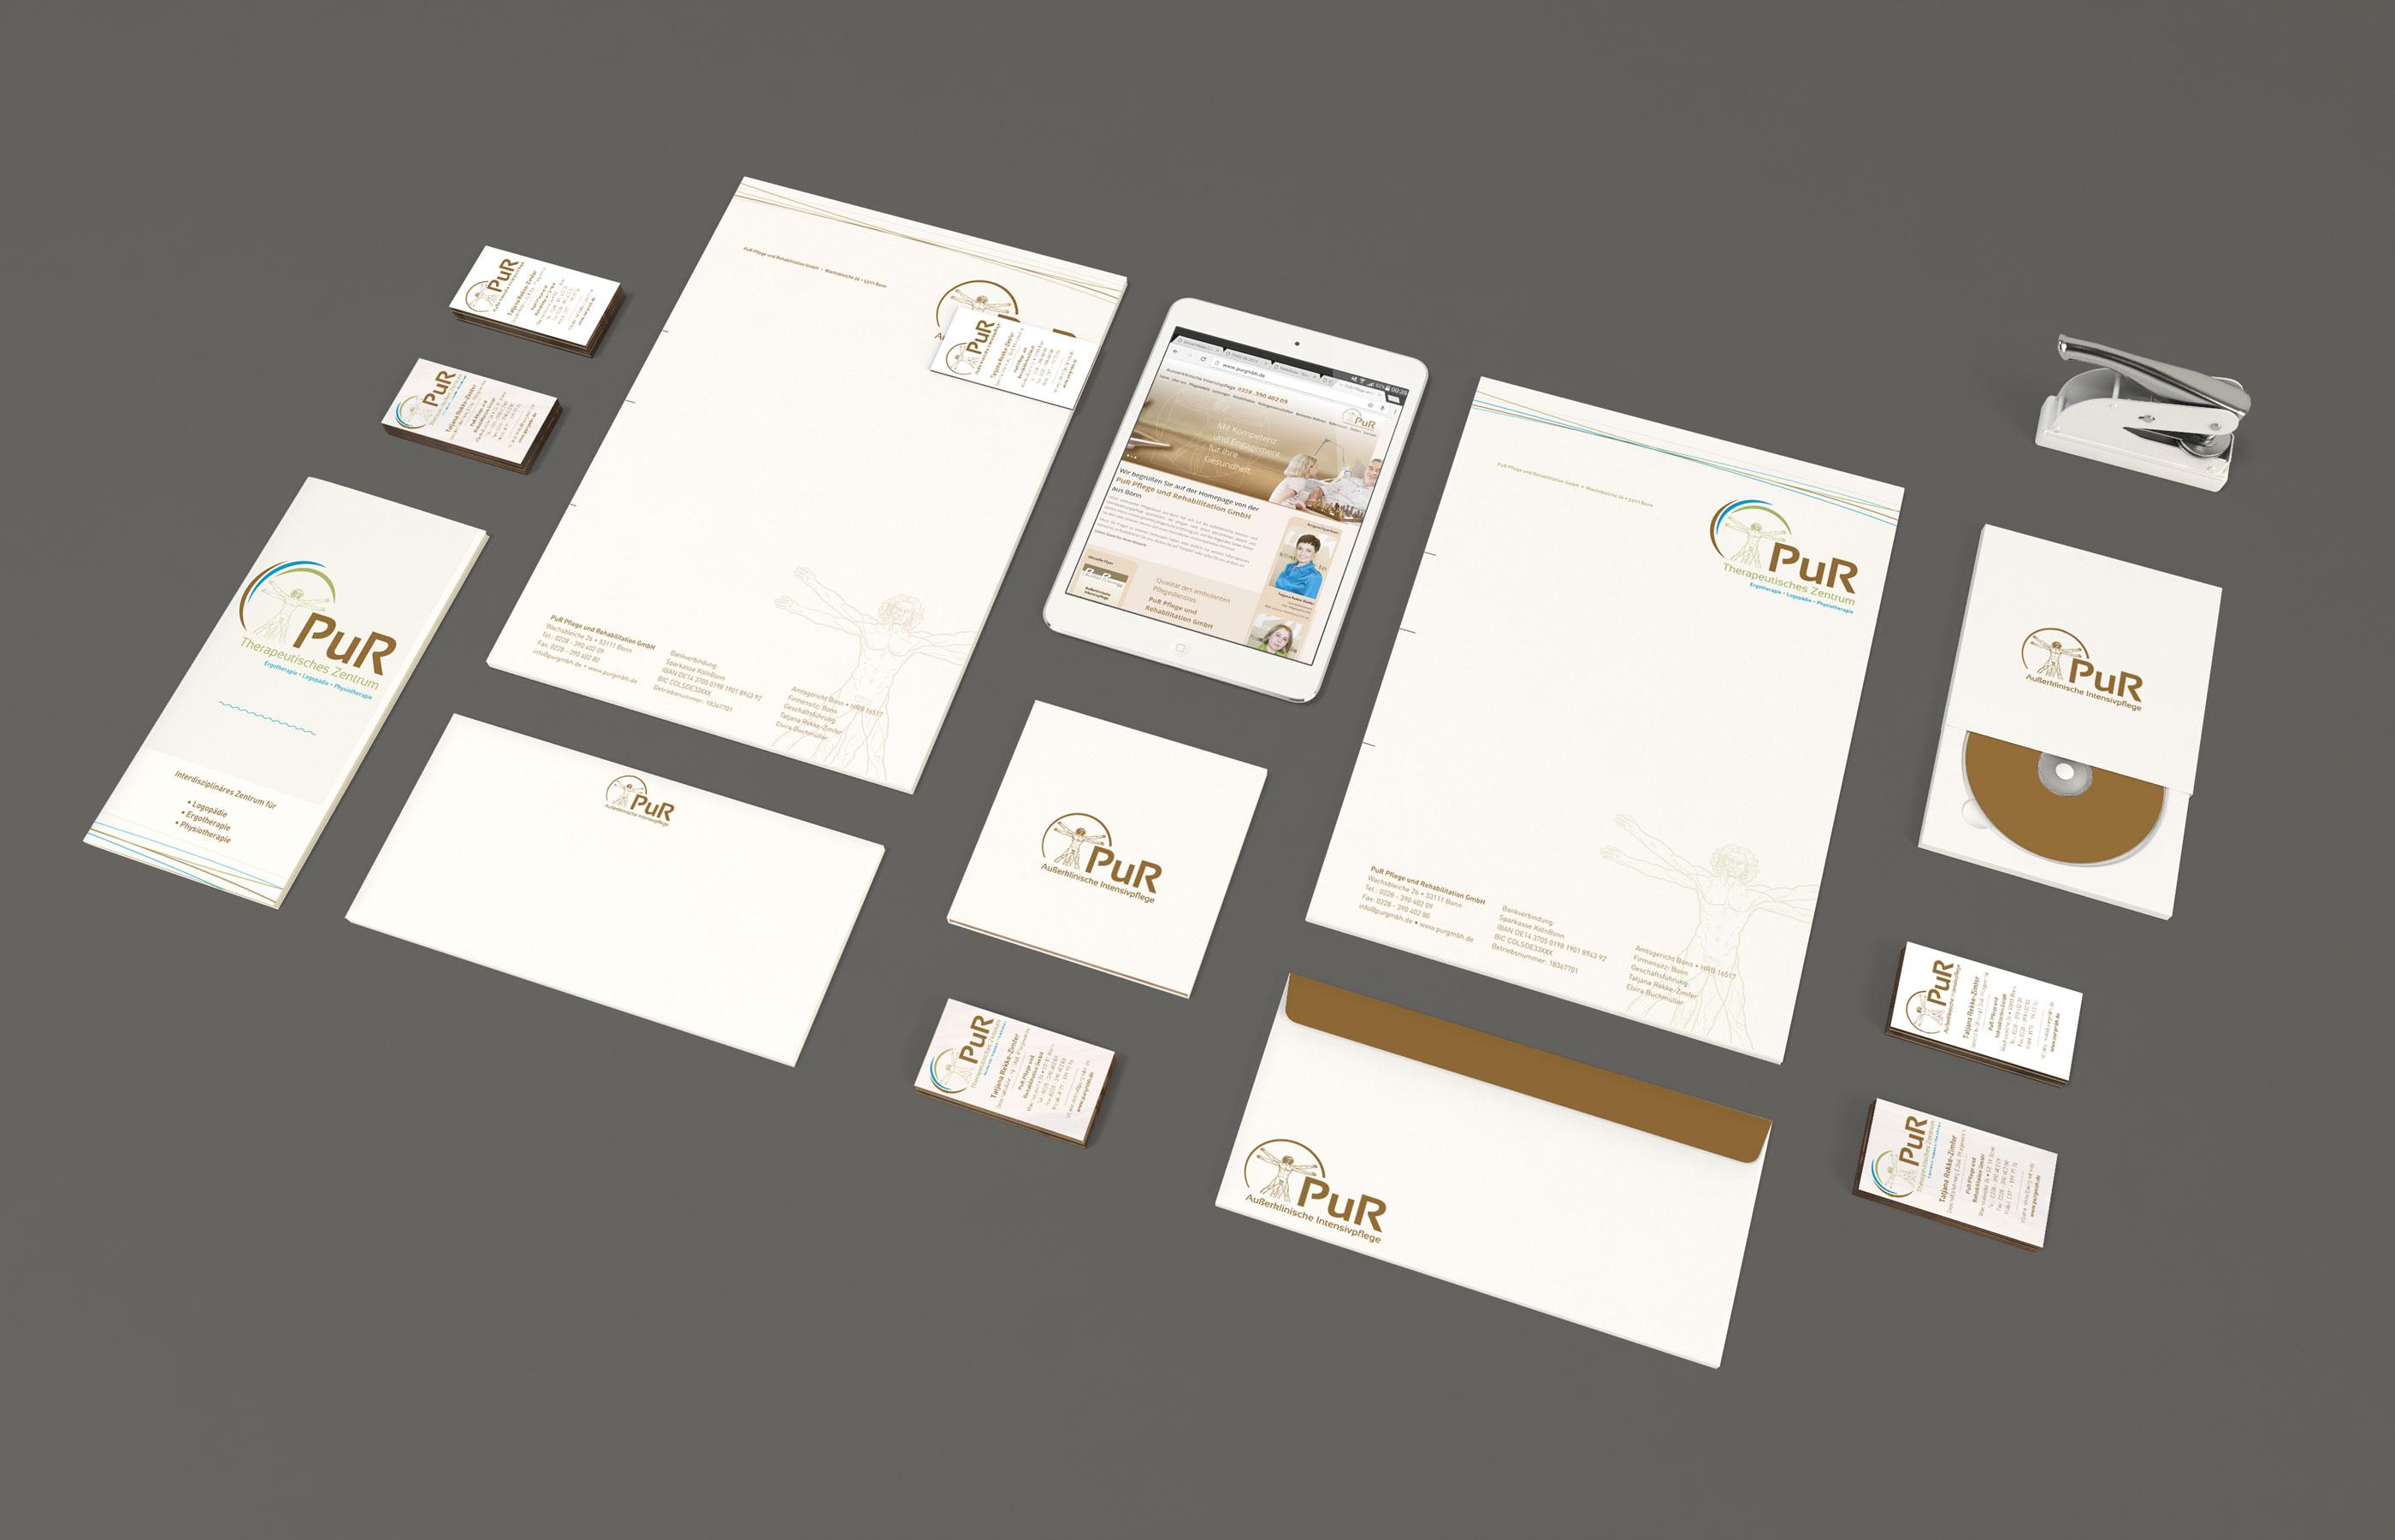 PuR GmbH Bonn Kommunikationsdesign Social Media Alexandra Wolf natürlich design Branding Corporate Design Grafik Design Bonn Goldstück